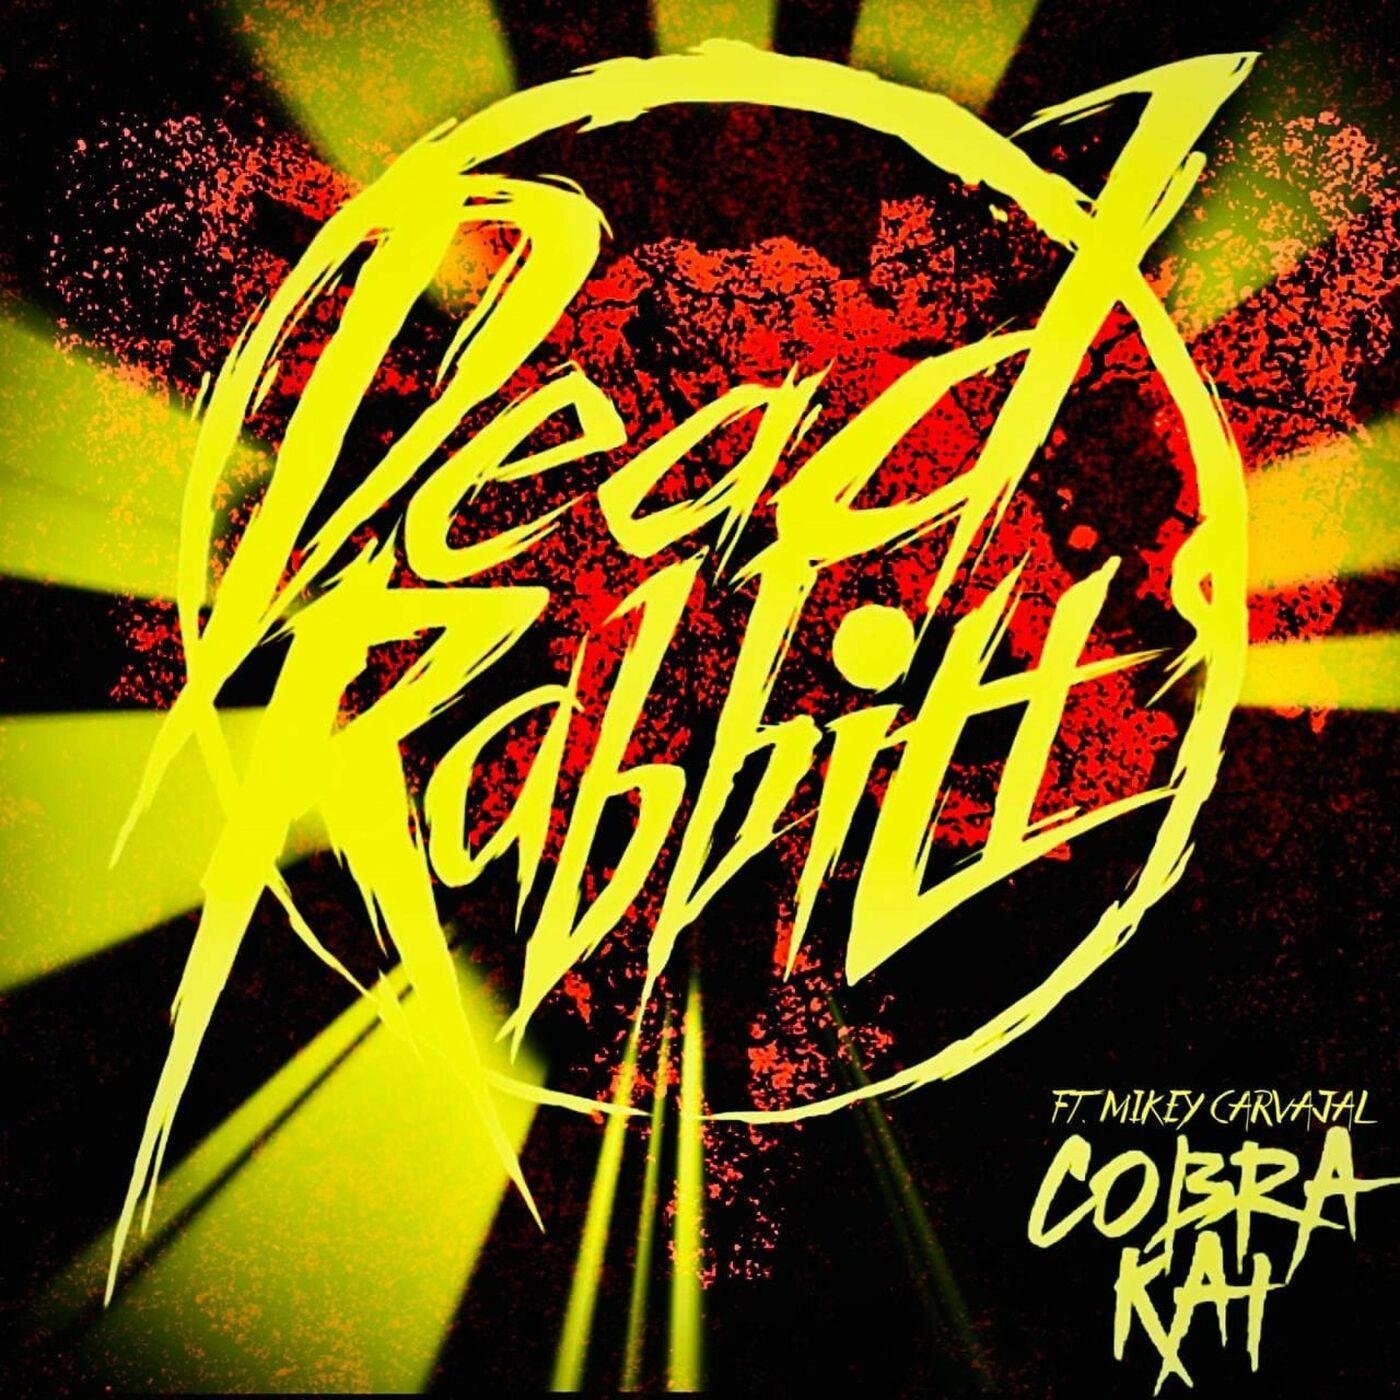 The Dead Rabbitts - Cobra Kai [single] (2021)